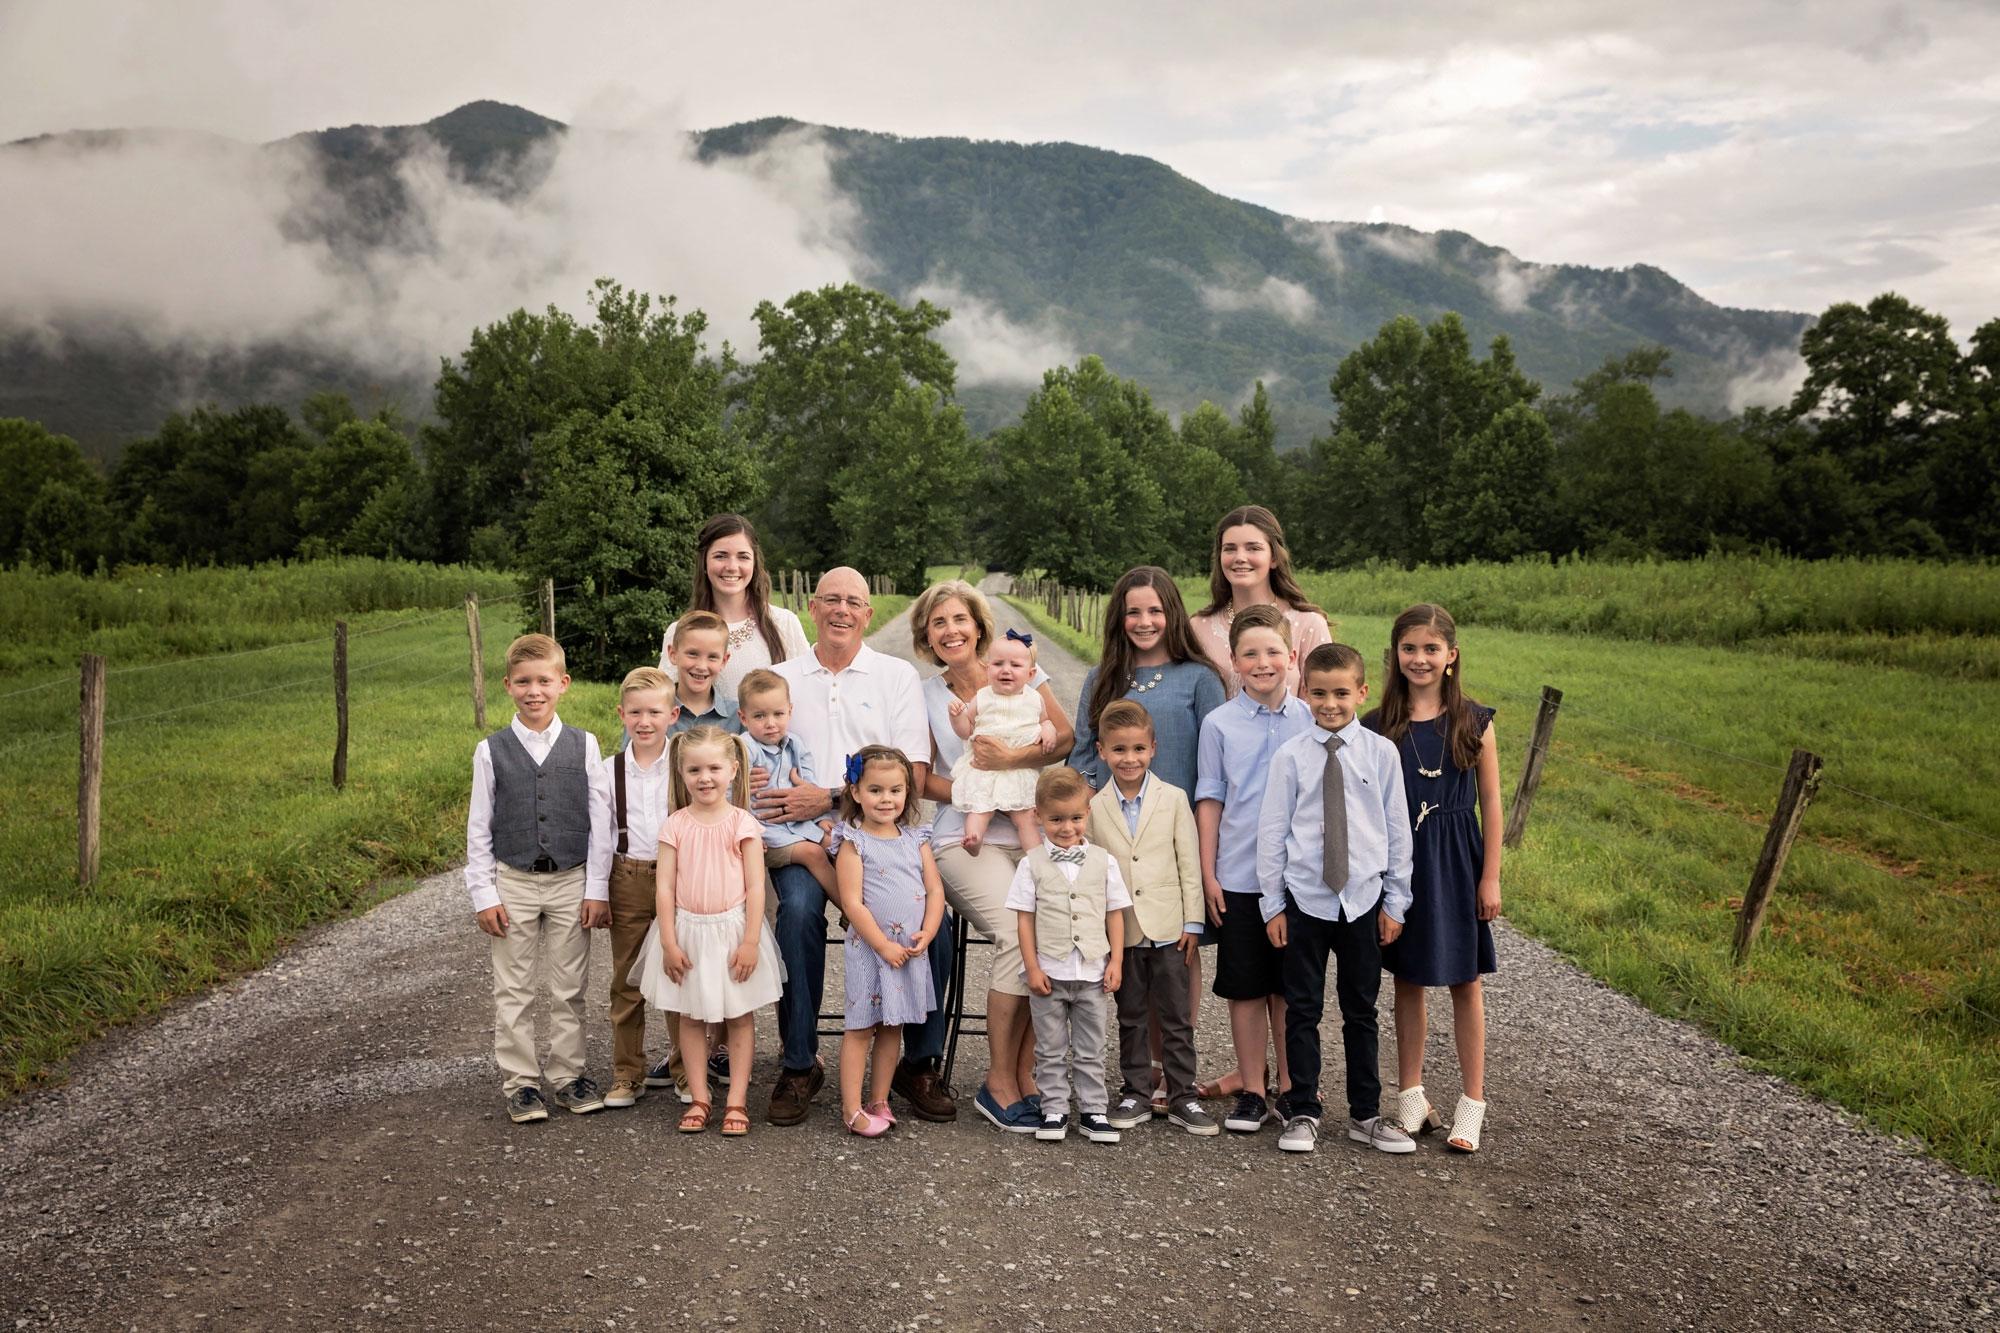 Gatlinburg-smoky-mountain-photographers.jpg